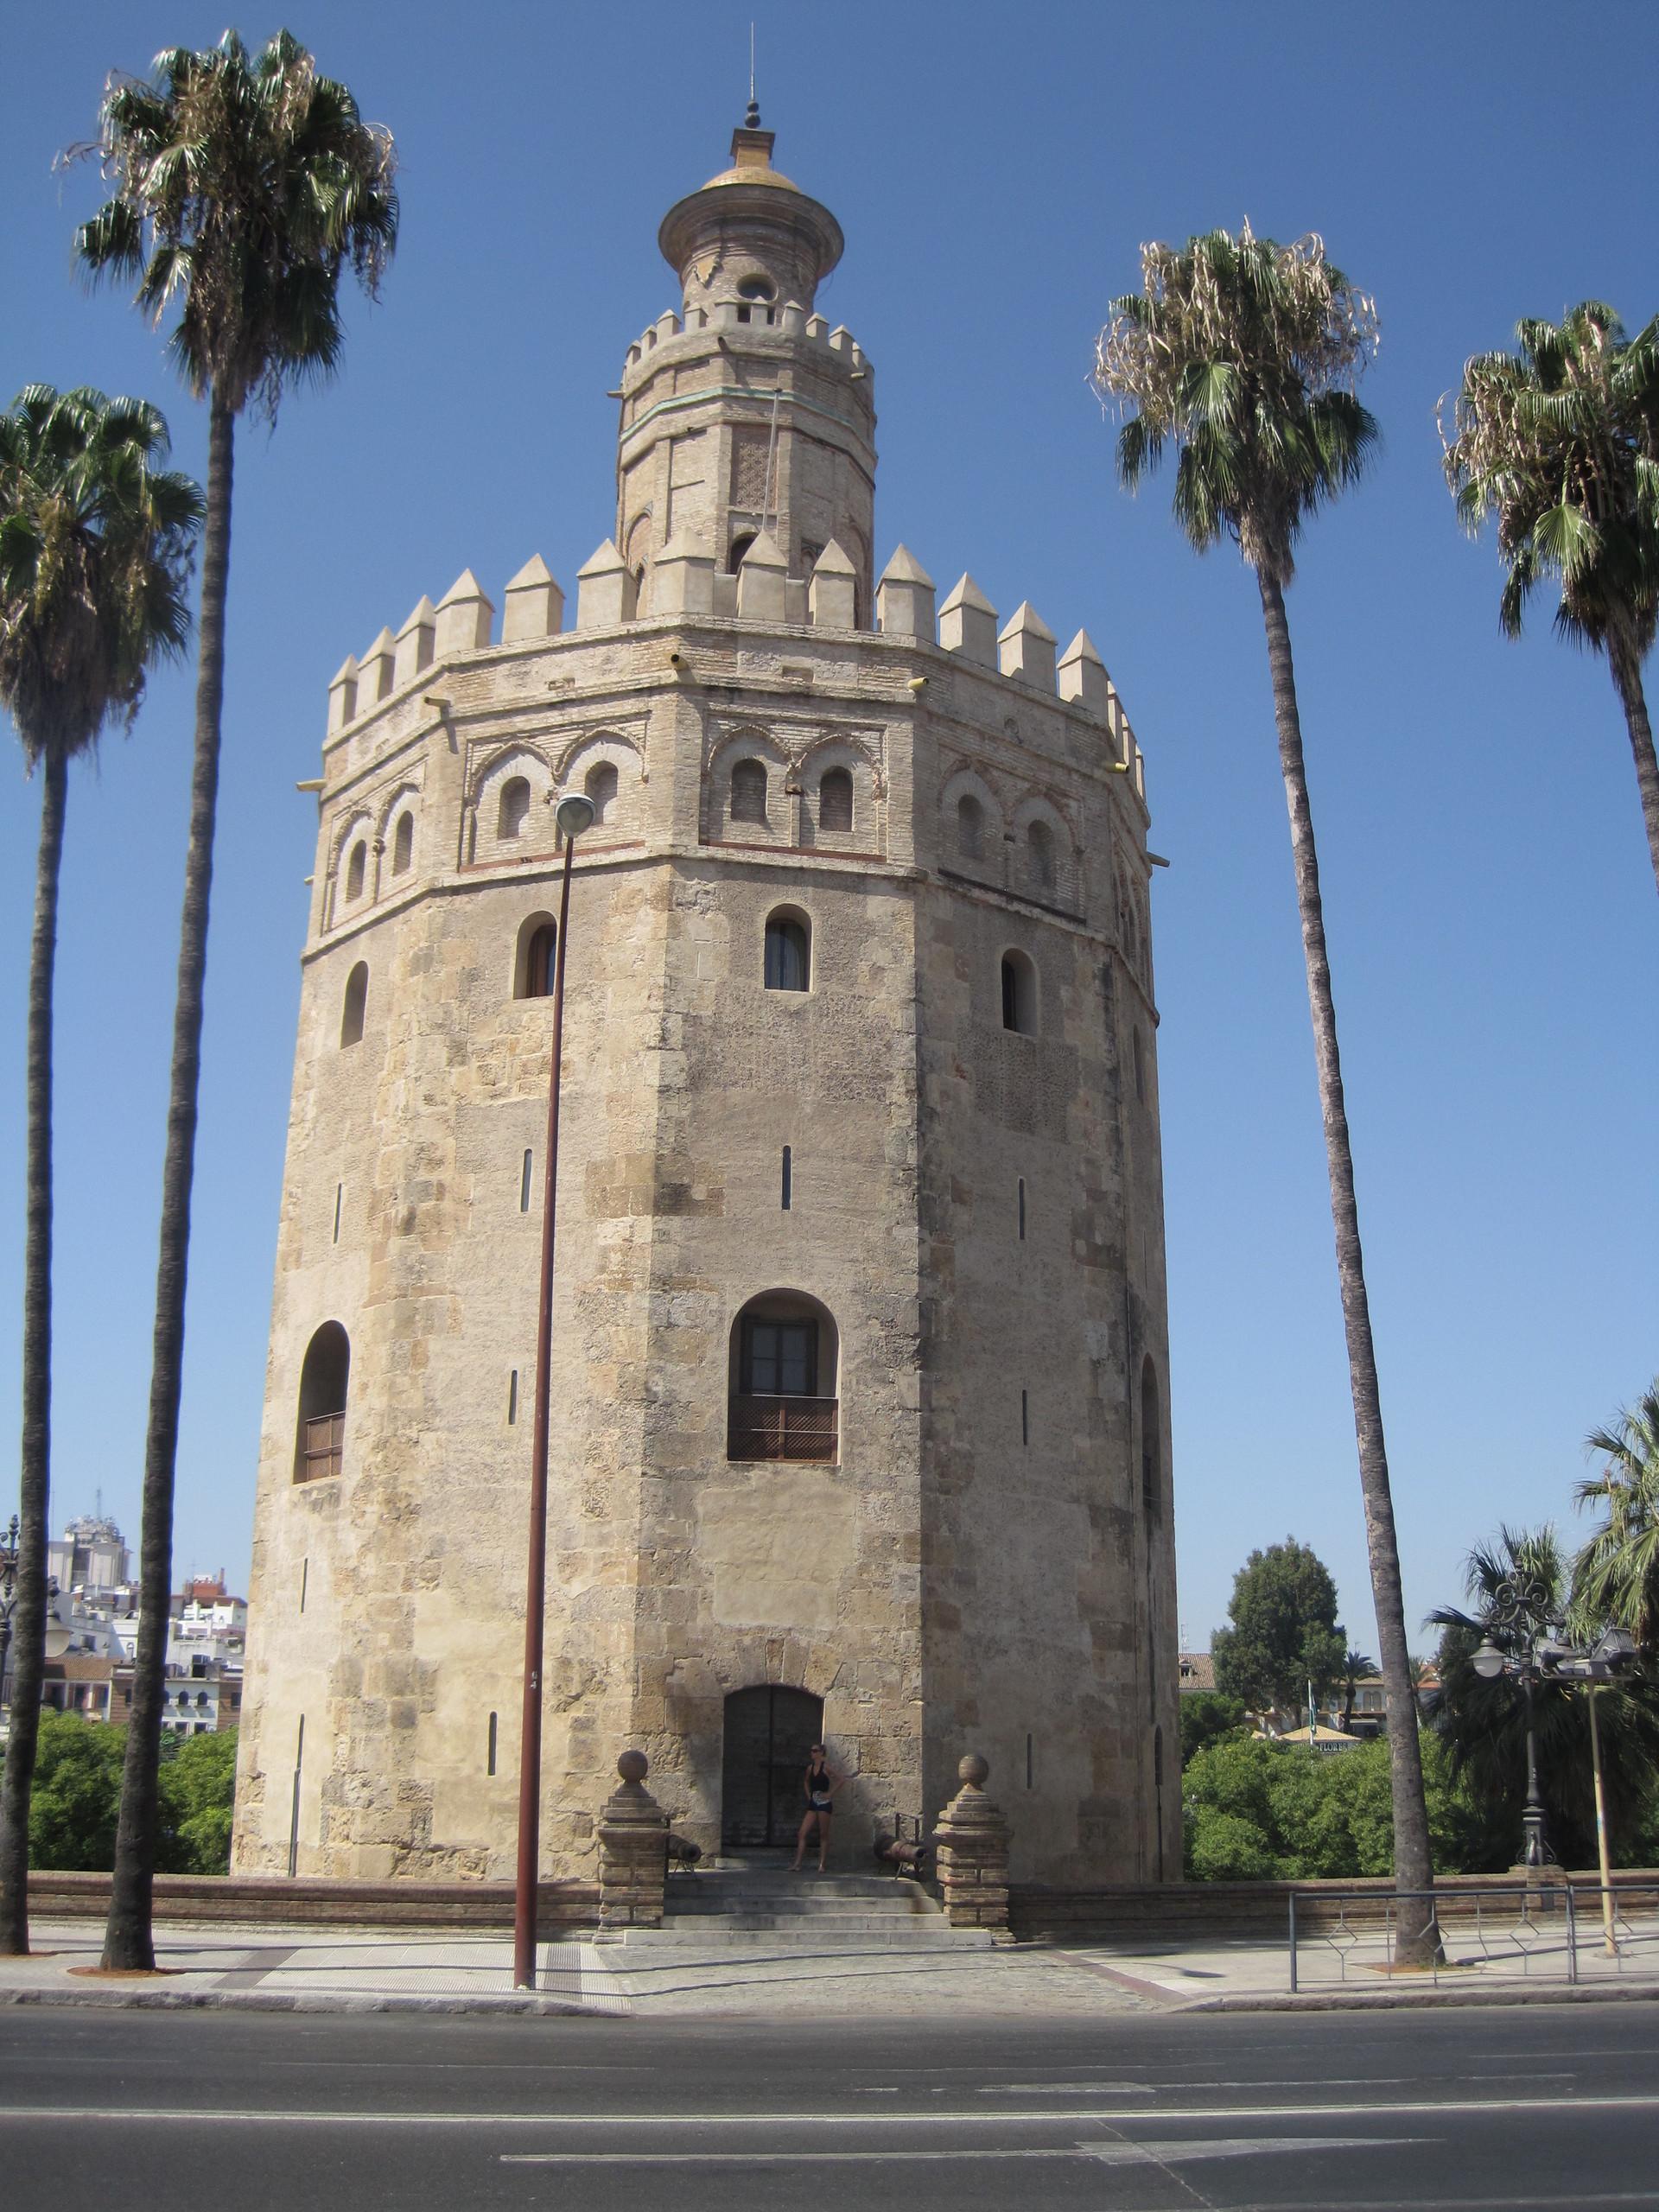 Sevilla parte 10 torre del oro y torre de la plata for La fabrica del mueble sevilla